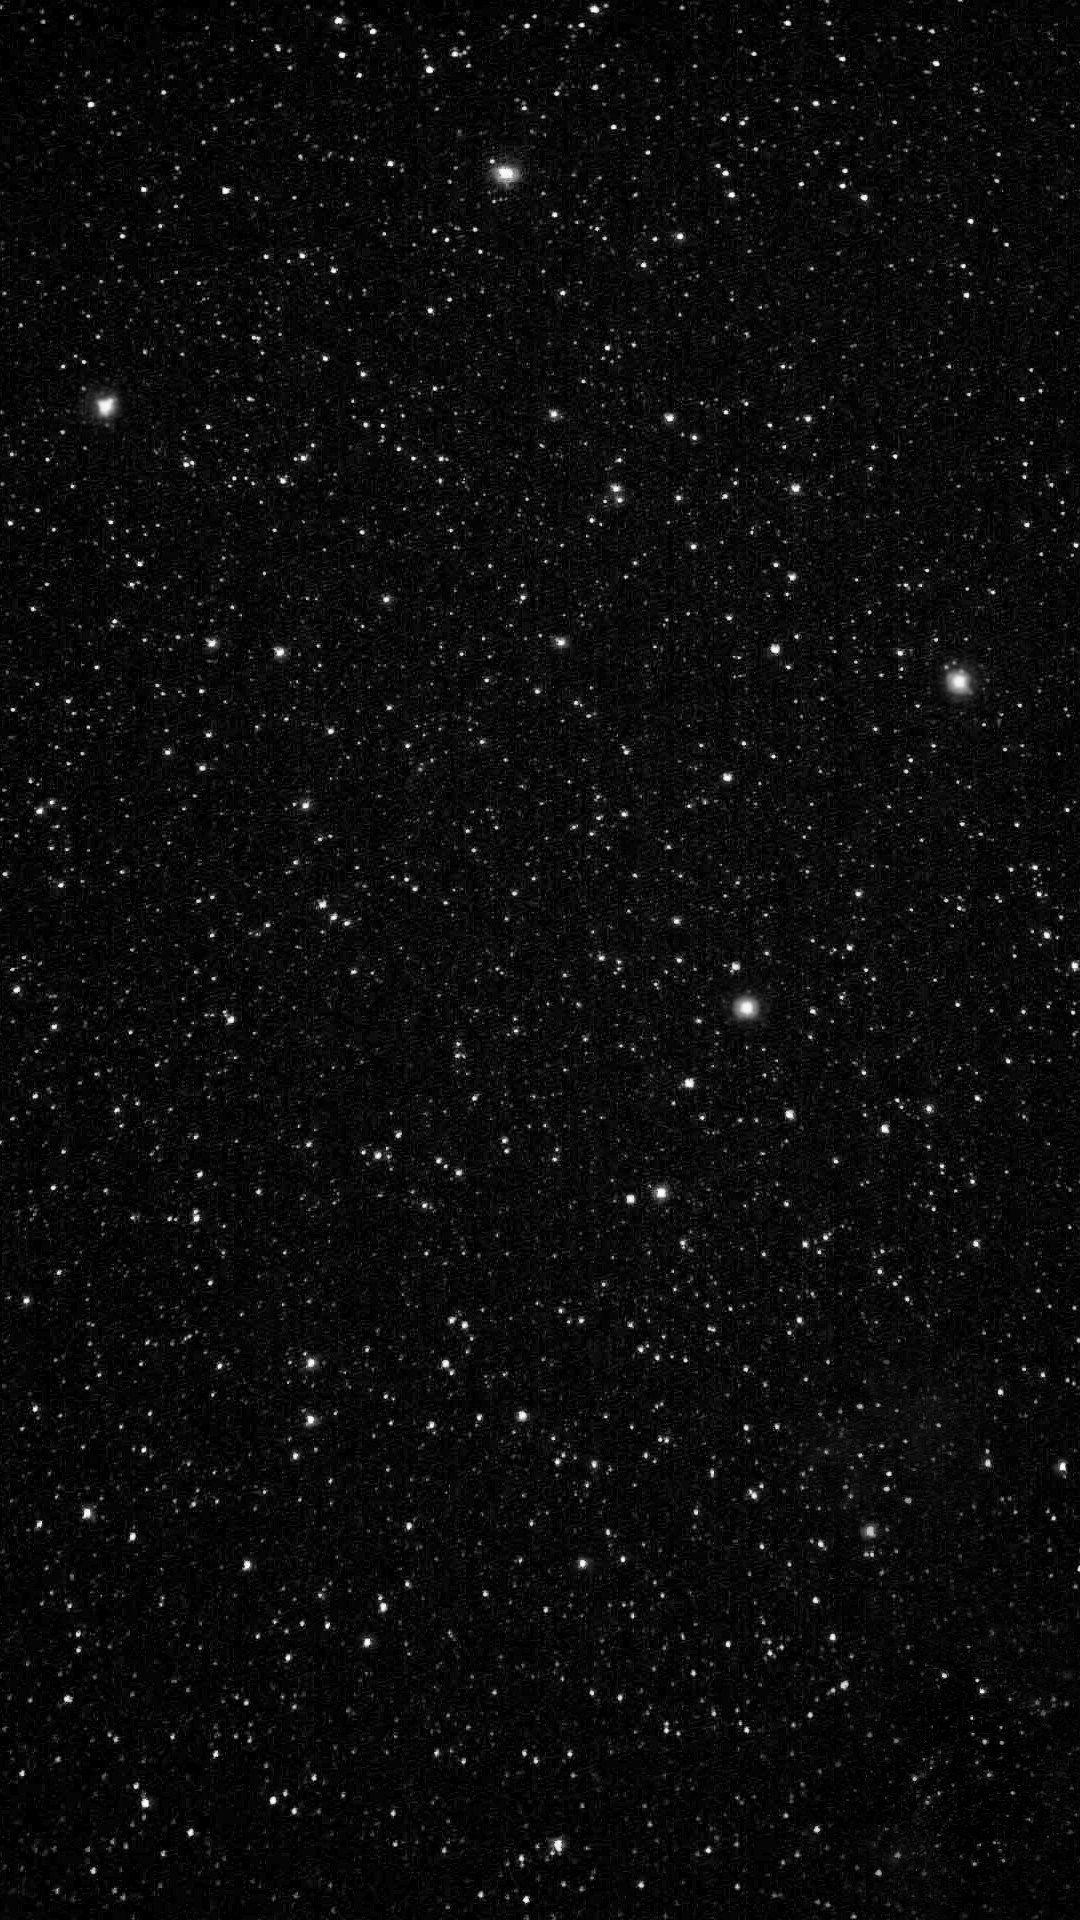 Black Star Hd Wallpapers Top Free Black Star Hd Backgrounds Black Wallpaper Live Wallpaper Iphone Black Wallpaper Iphone